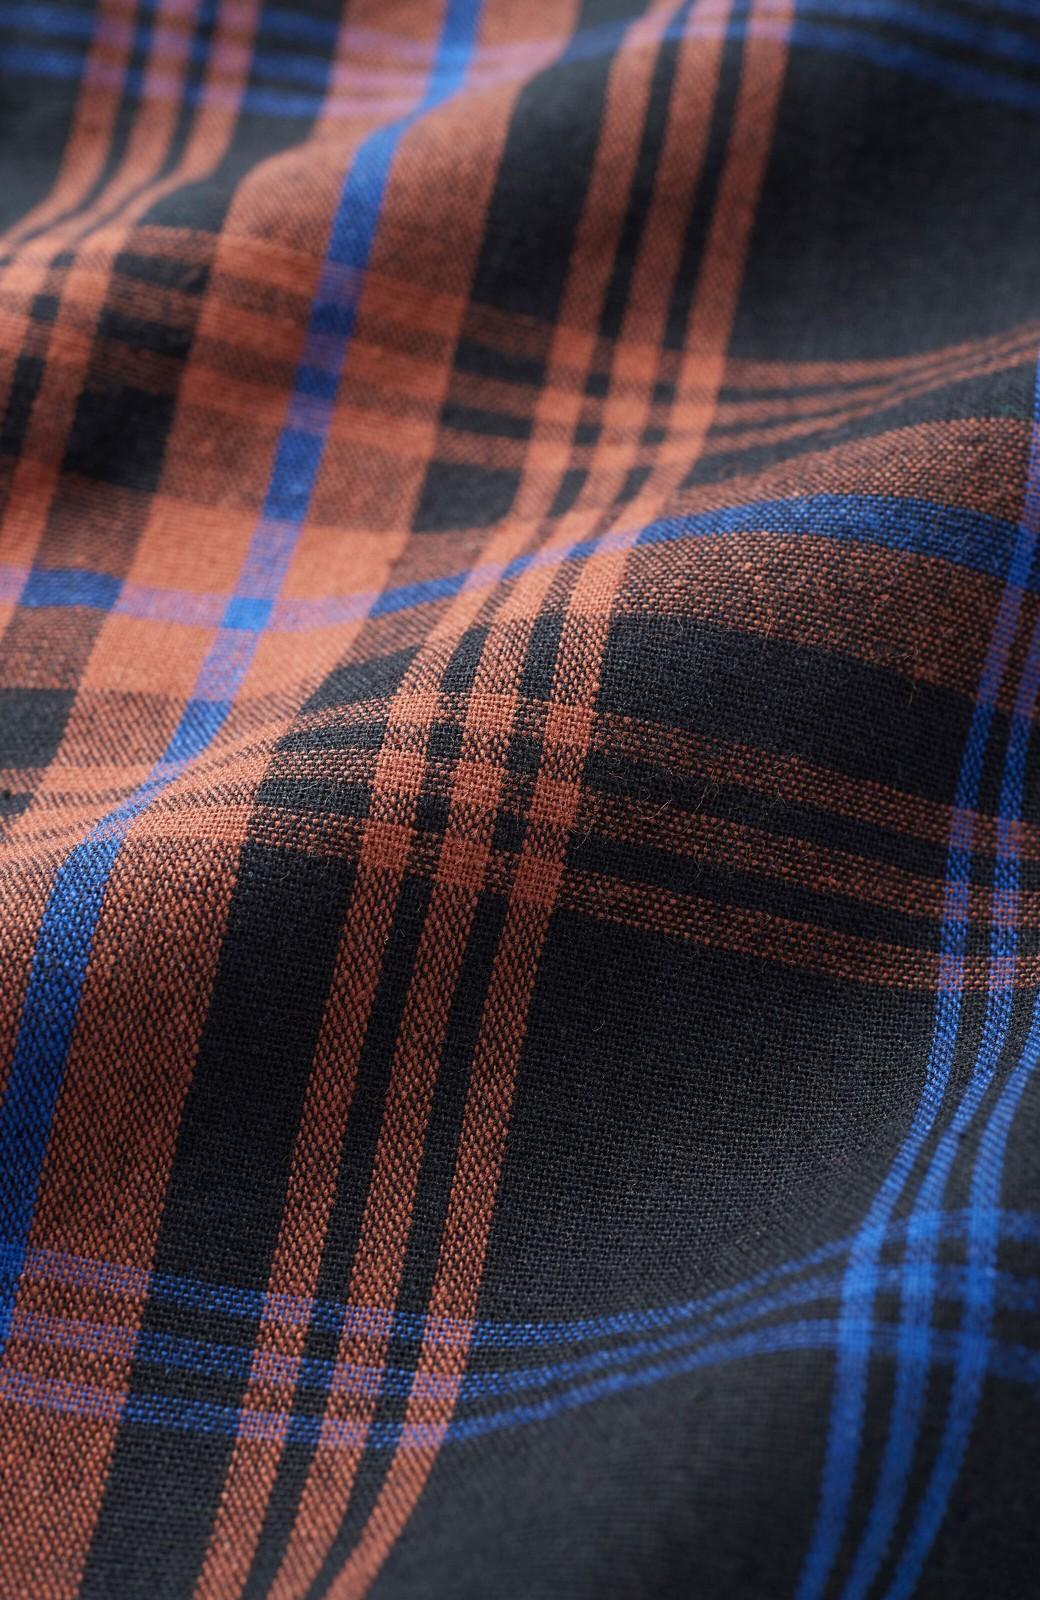 haco! 【高橋愛さんコラボ】セットアップでも別々でも楽しめる リボンアクセントのチェックブラウス&スカート by LOVE&PEACE PROJECT <ダークネイビー>の商品写真4